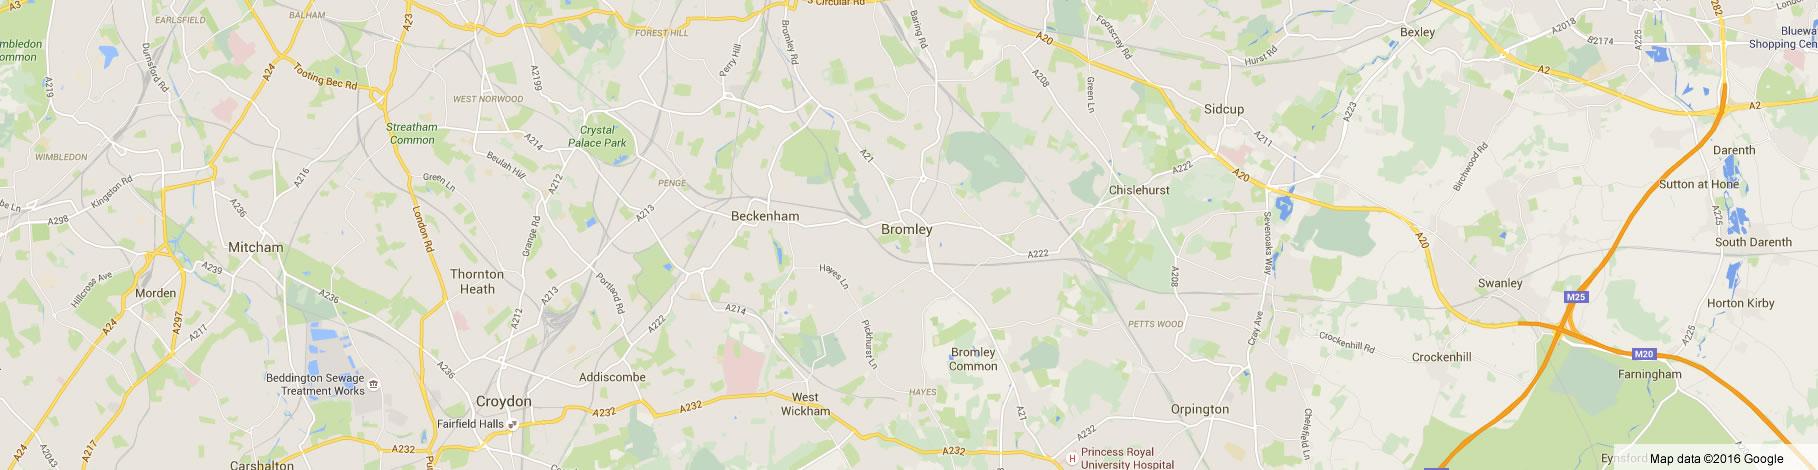 Bromley